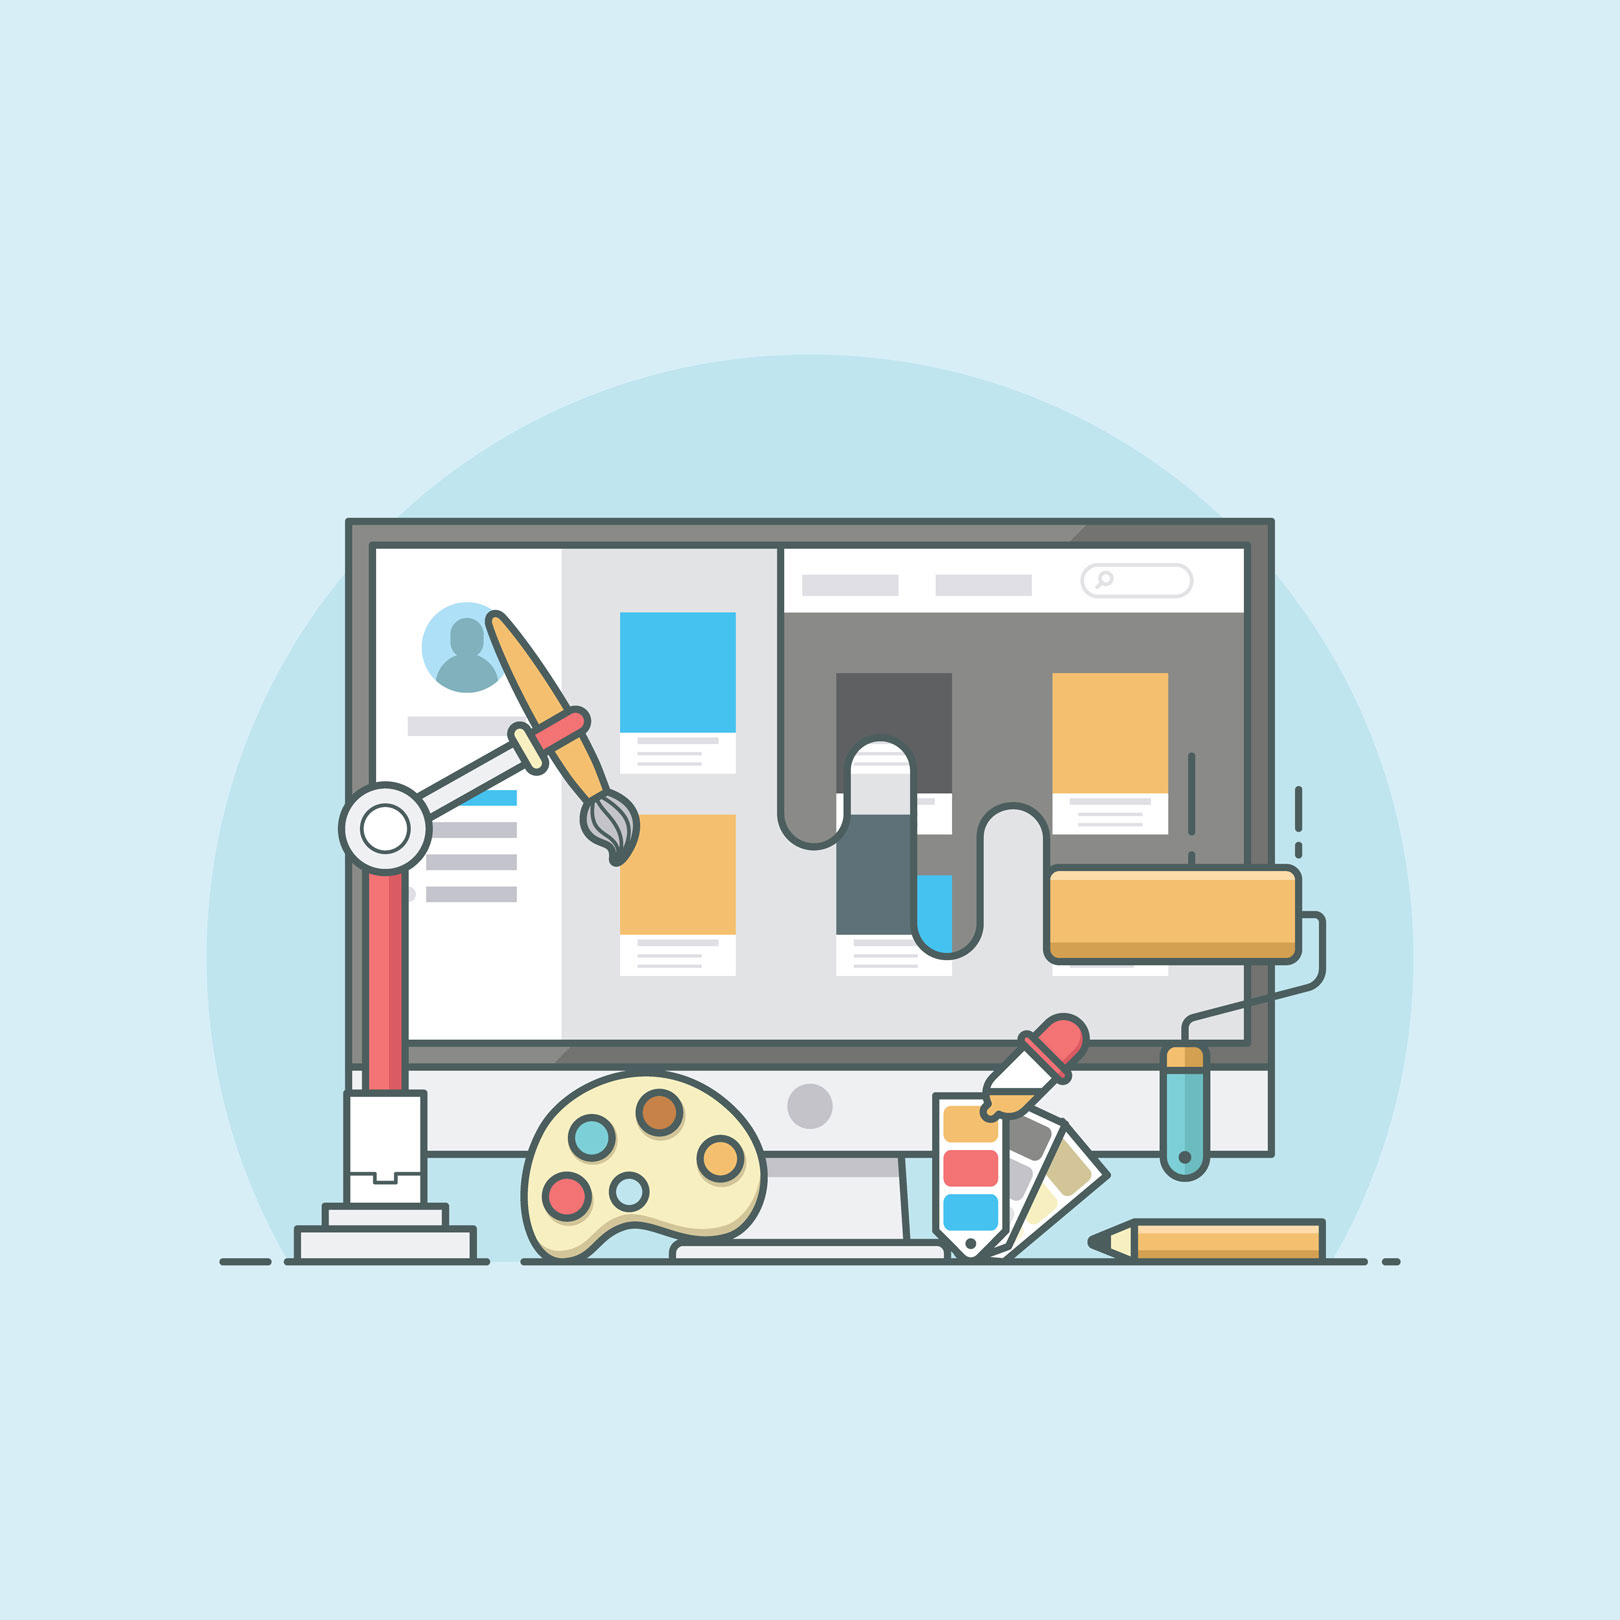 Redesign >> 9 Inspiring Redesign Concepts For Popular Websites